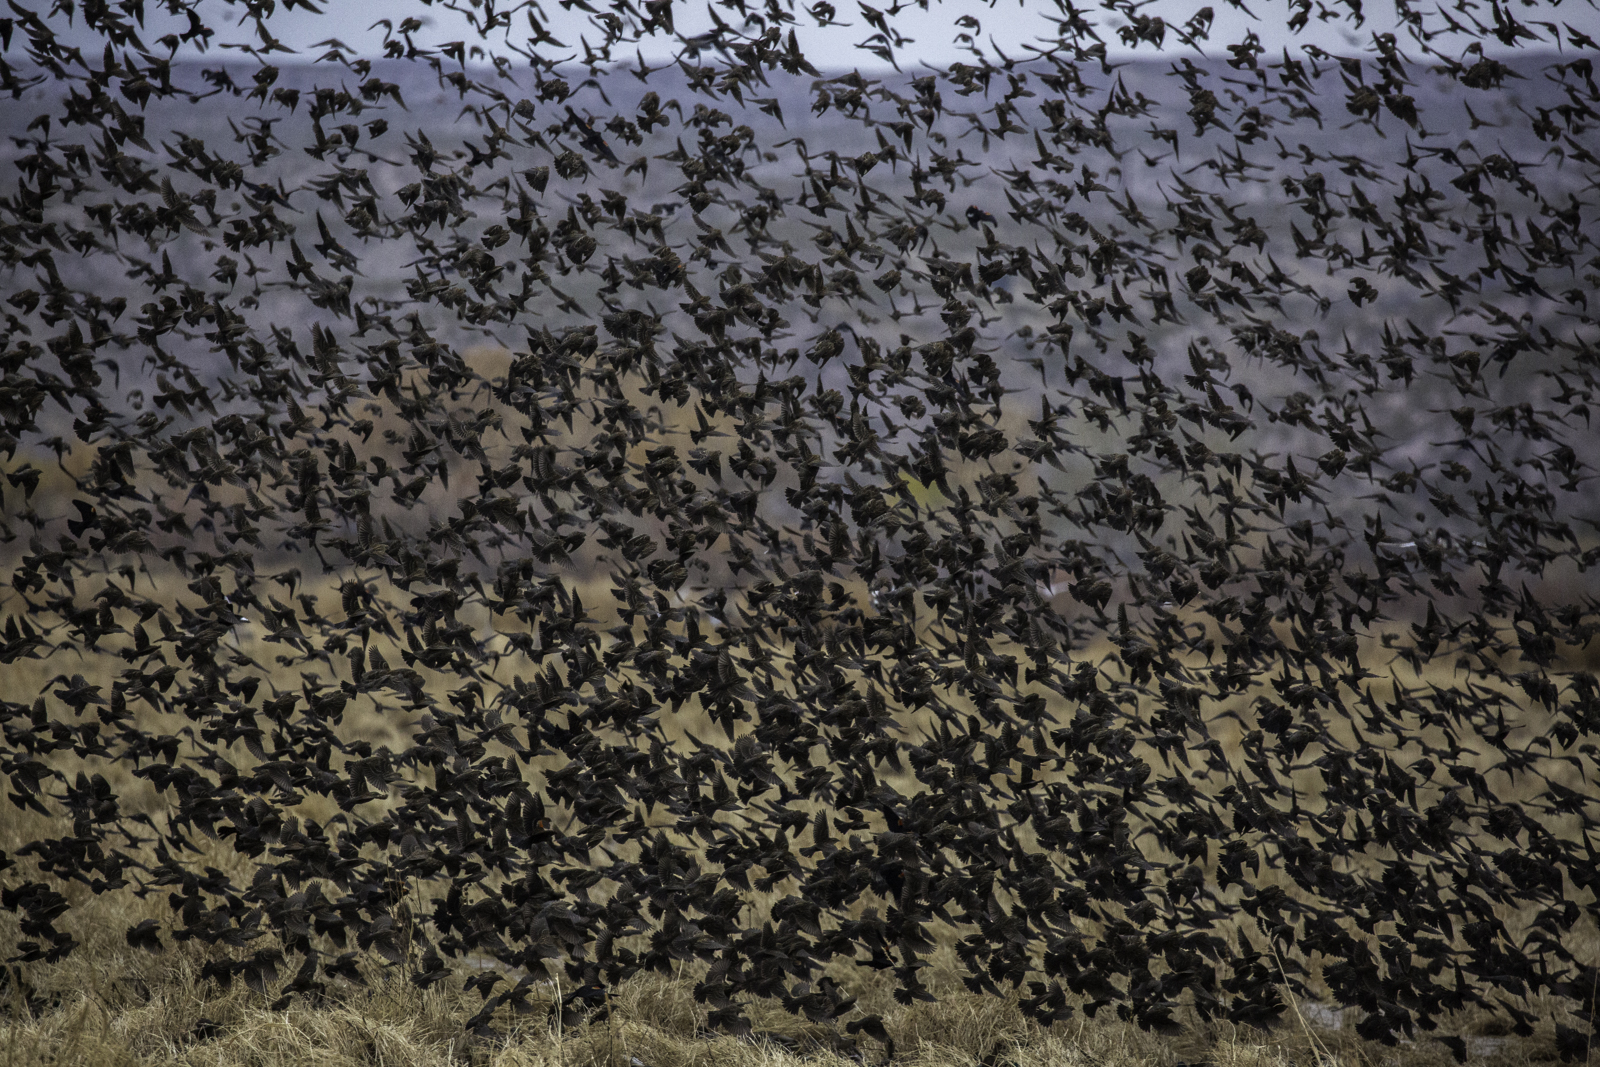 Redwing Blackbirds Flocking from Feeding Site